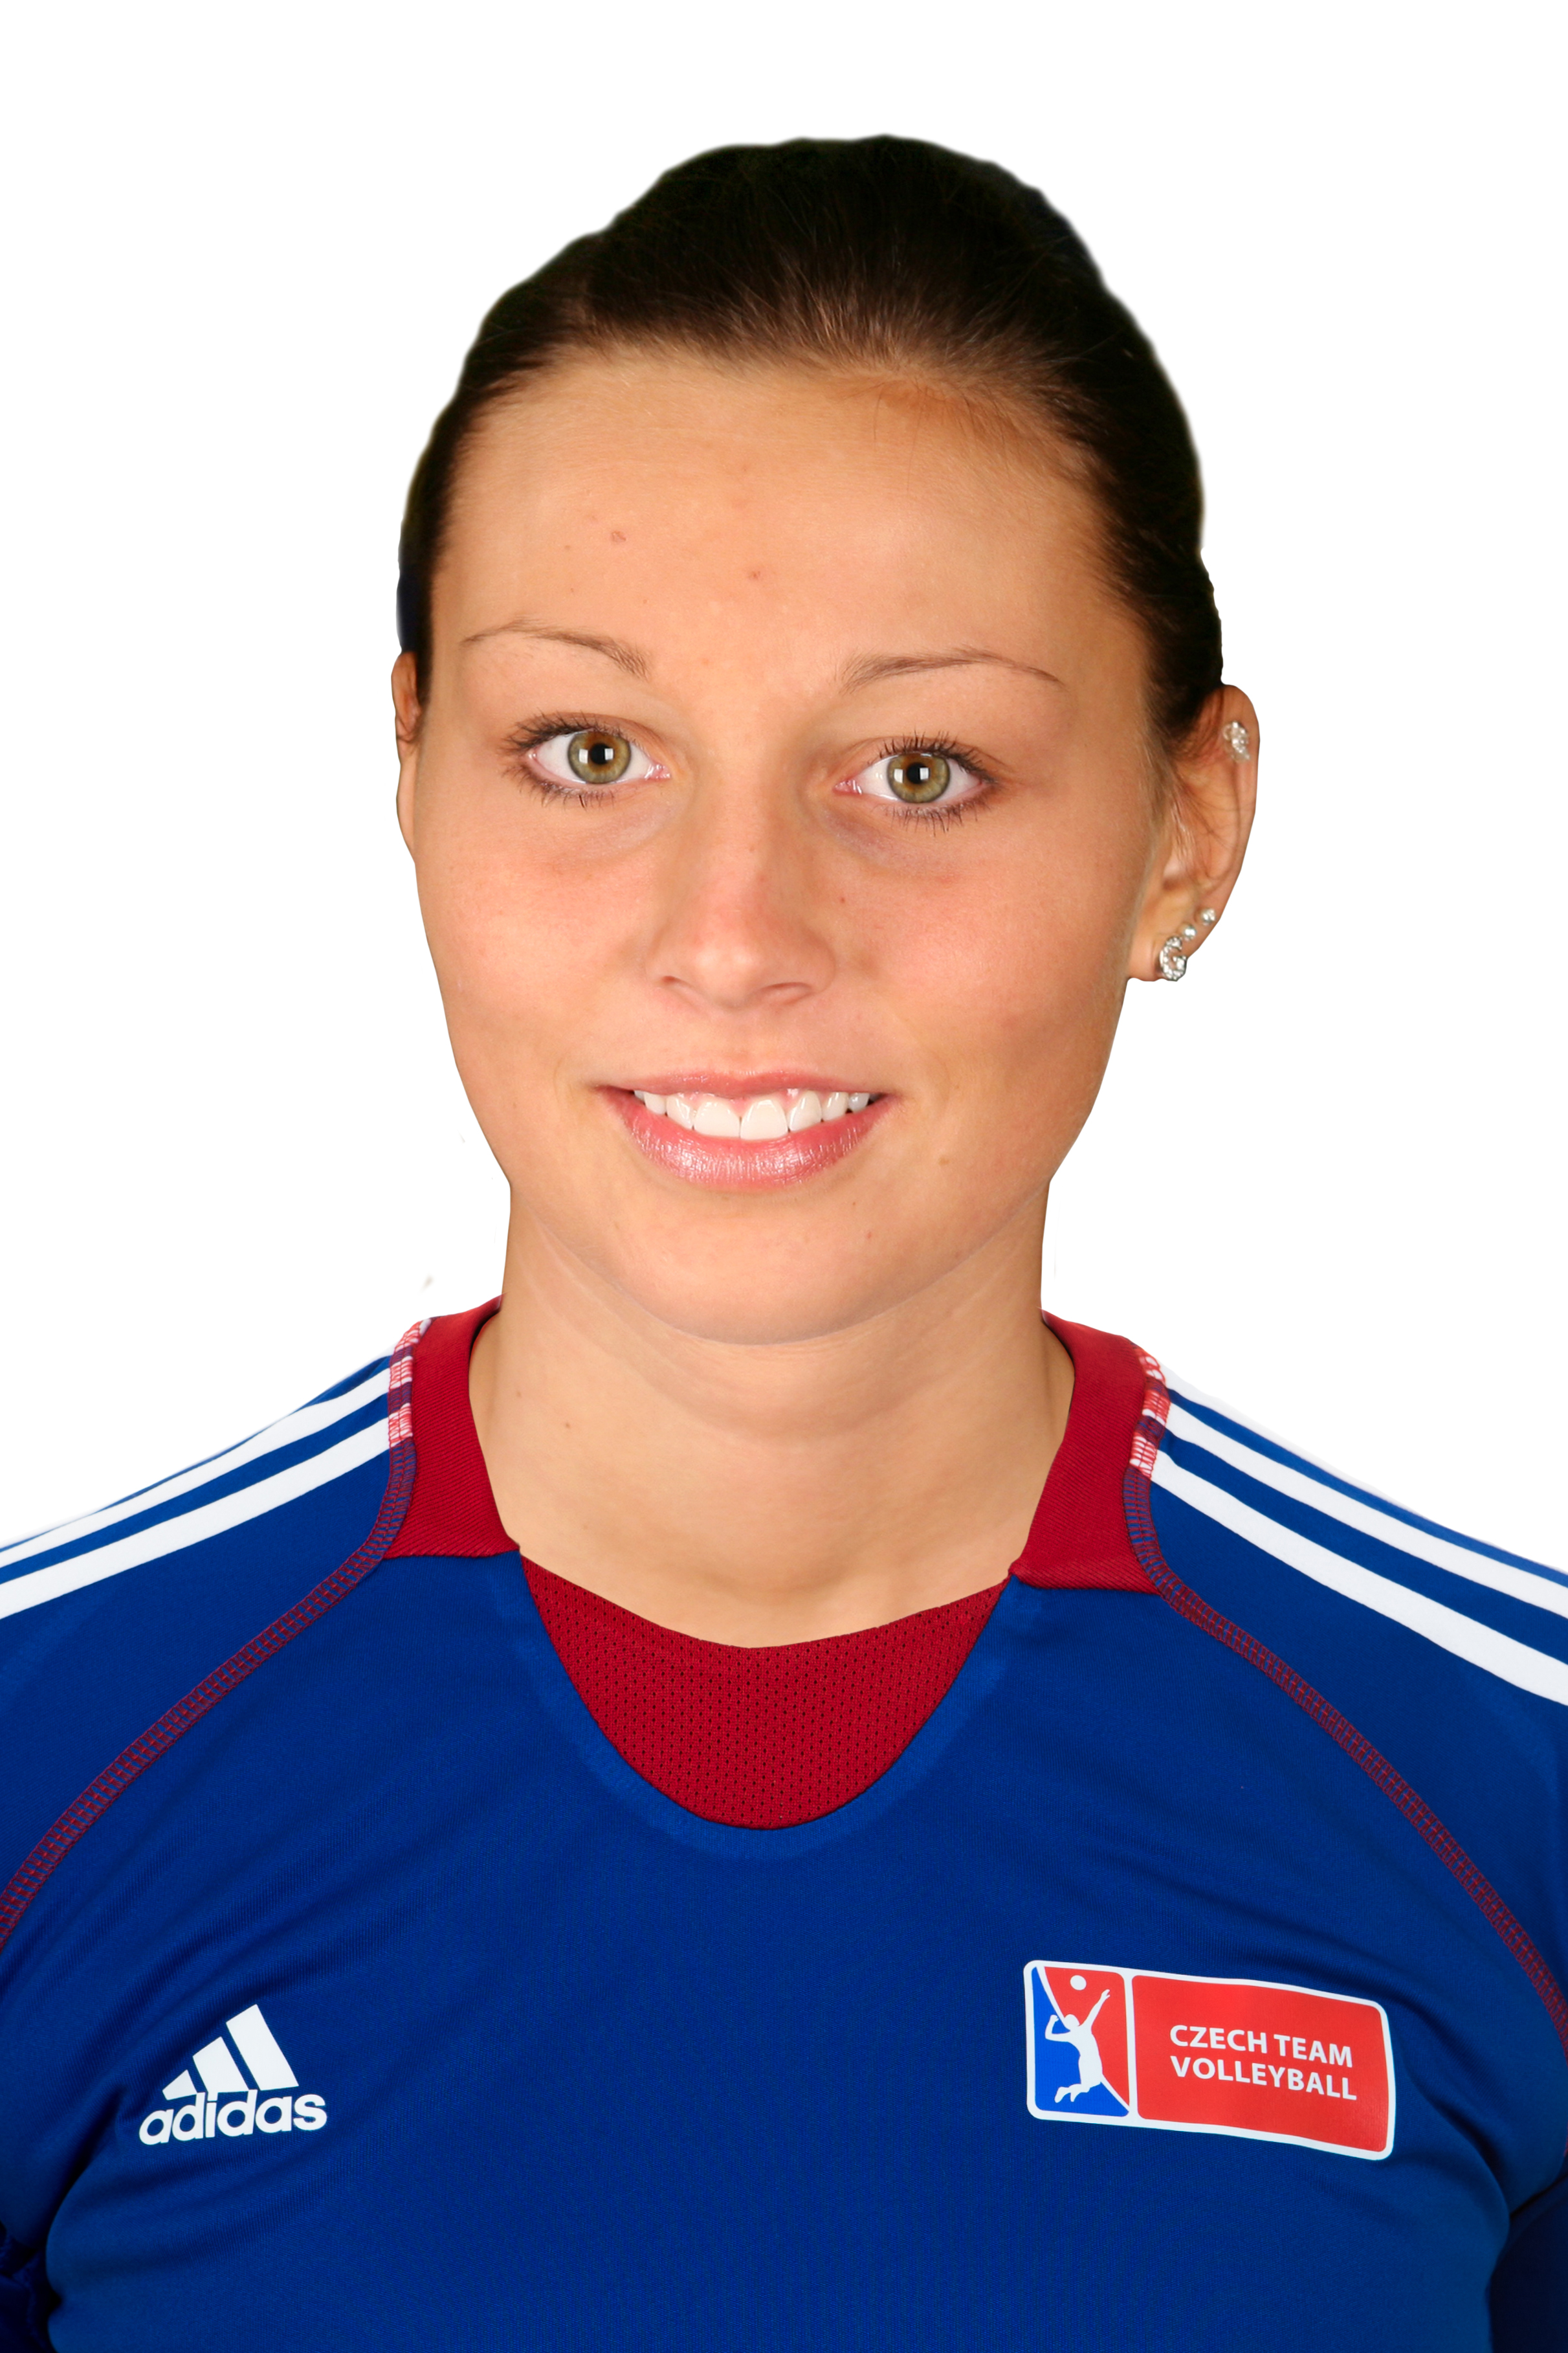 Sona Mikyskova